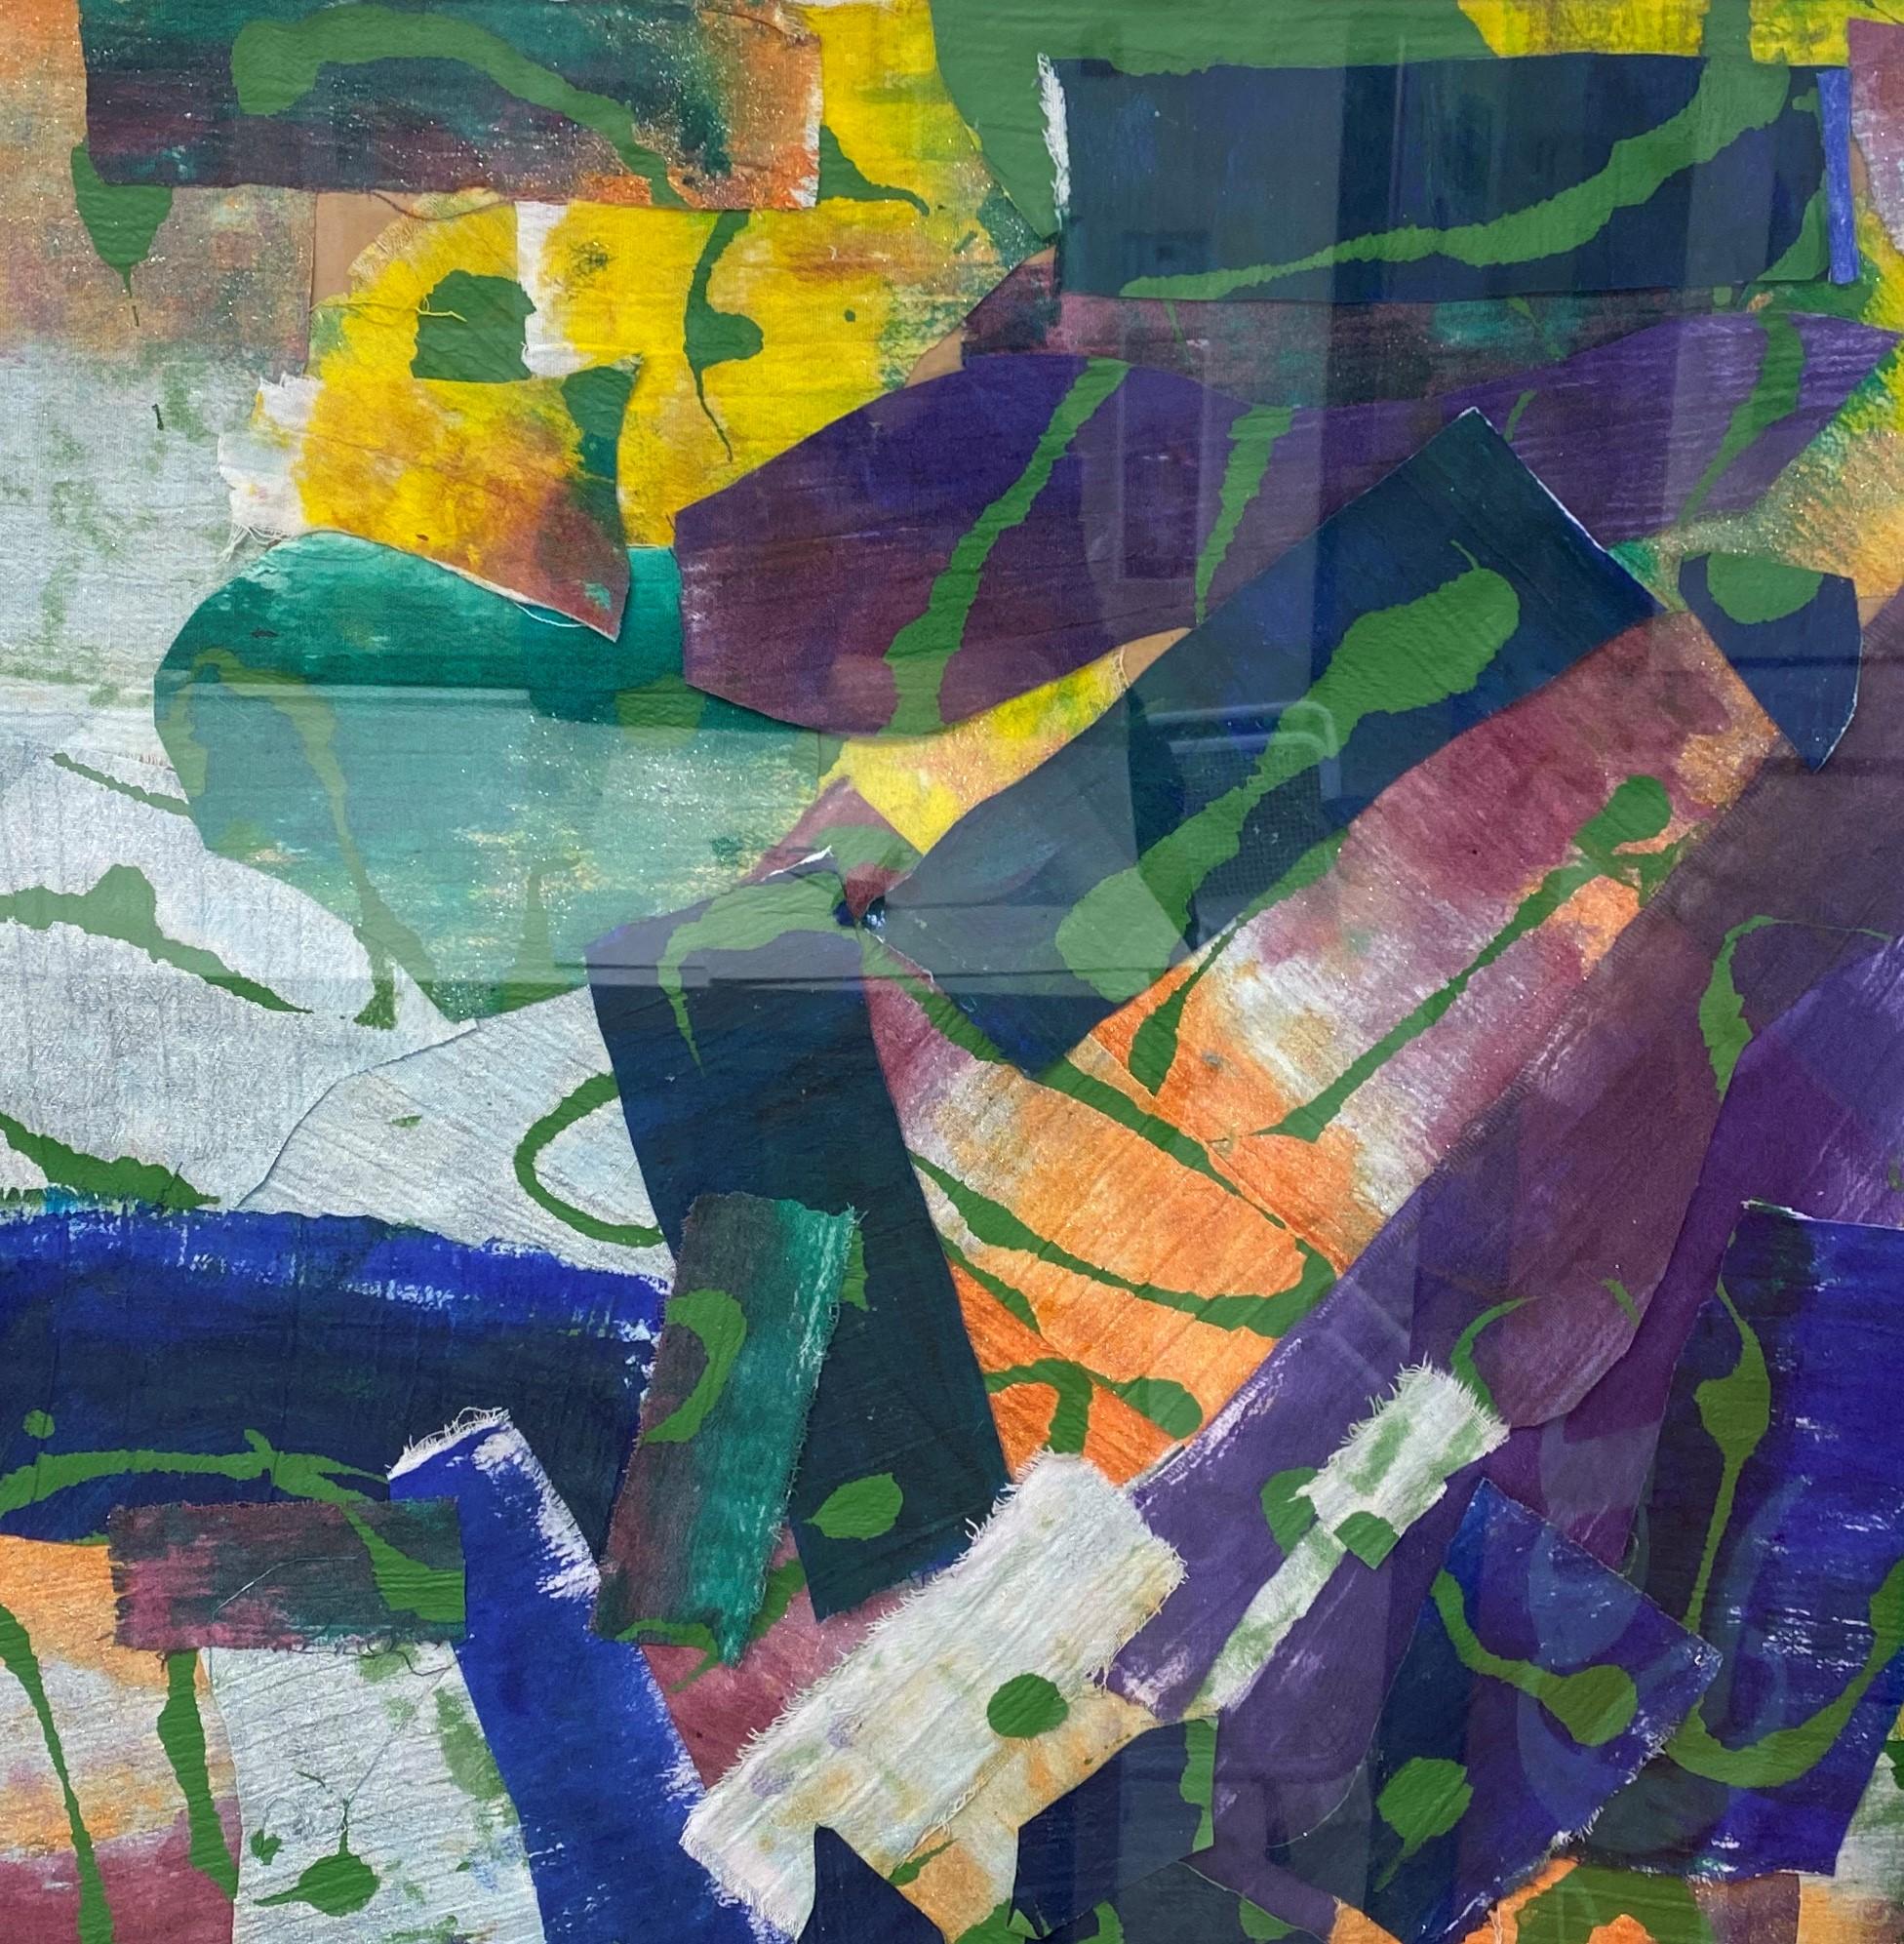 Bid on KE Life Charity Auction DD Artwork